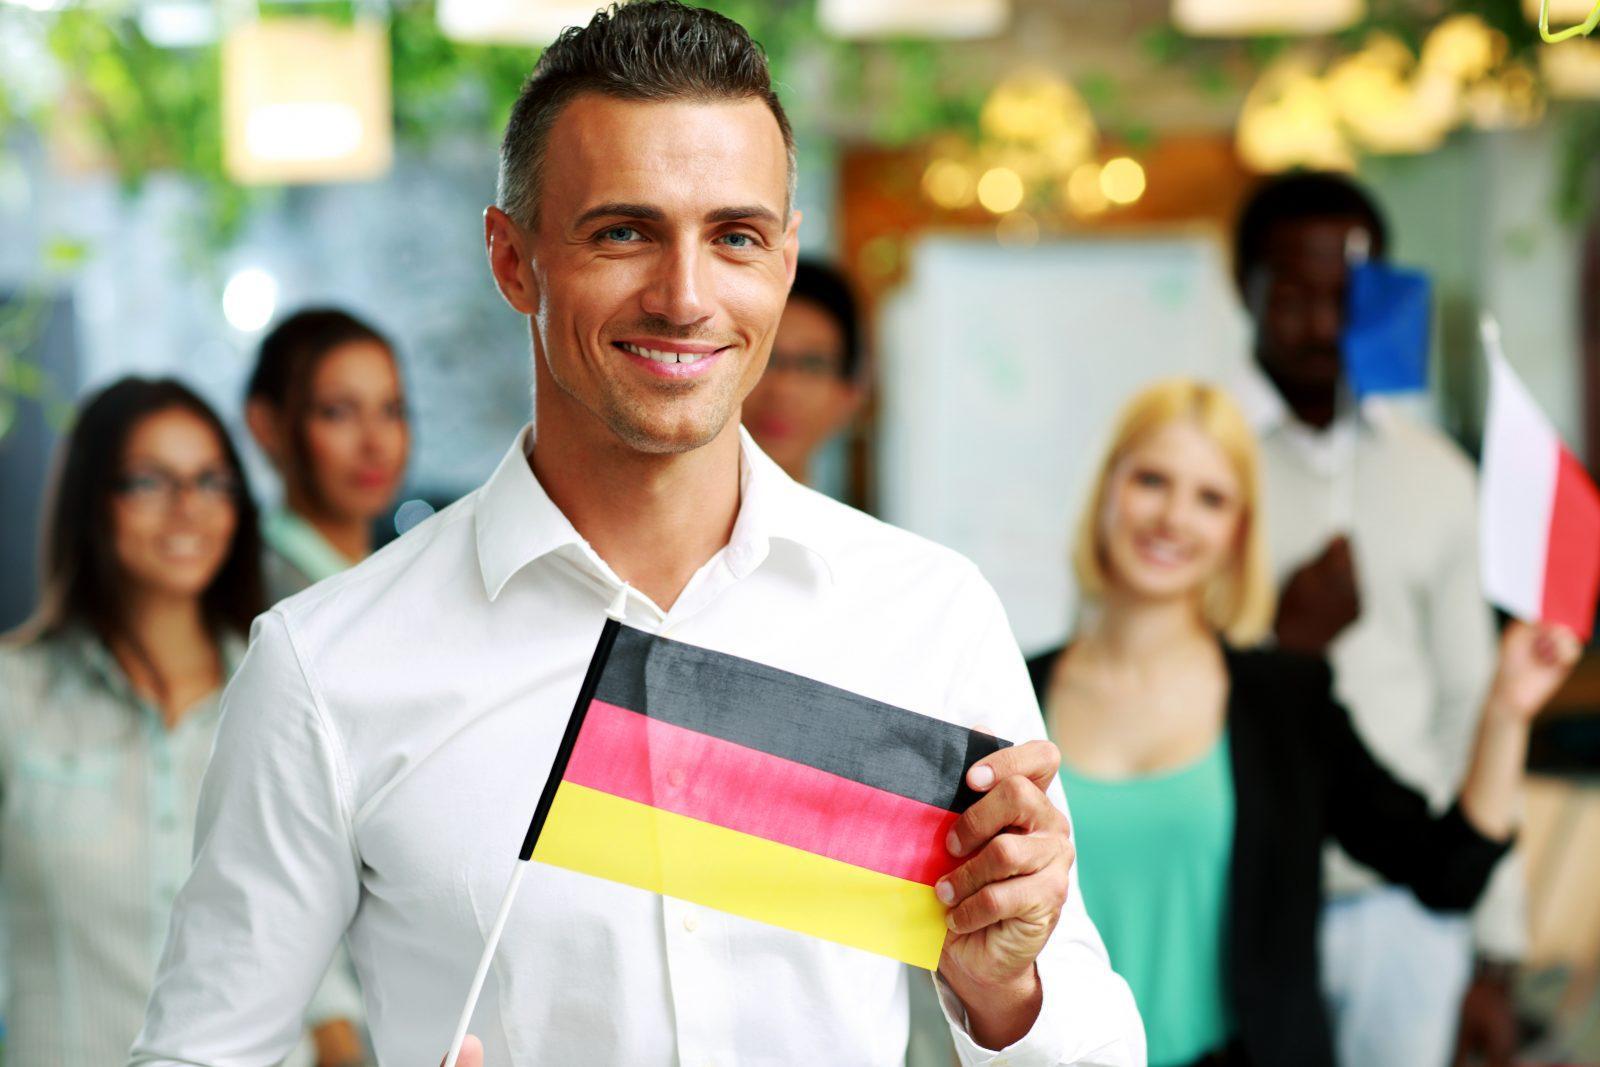 C:\Users\Сергей\Desktop\biznesmen-s-flagom-germanii-v-rukah-glavnaja.jpg